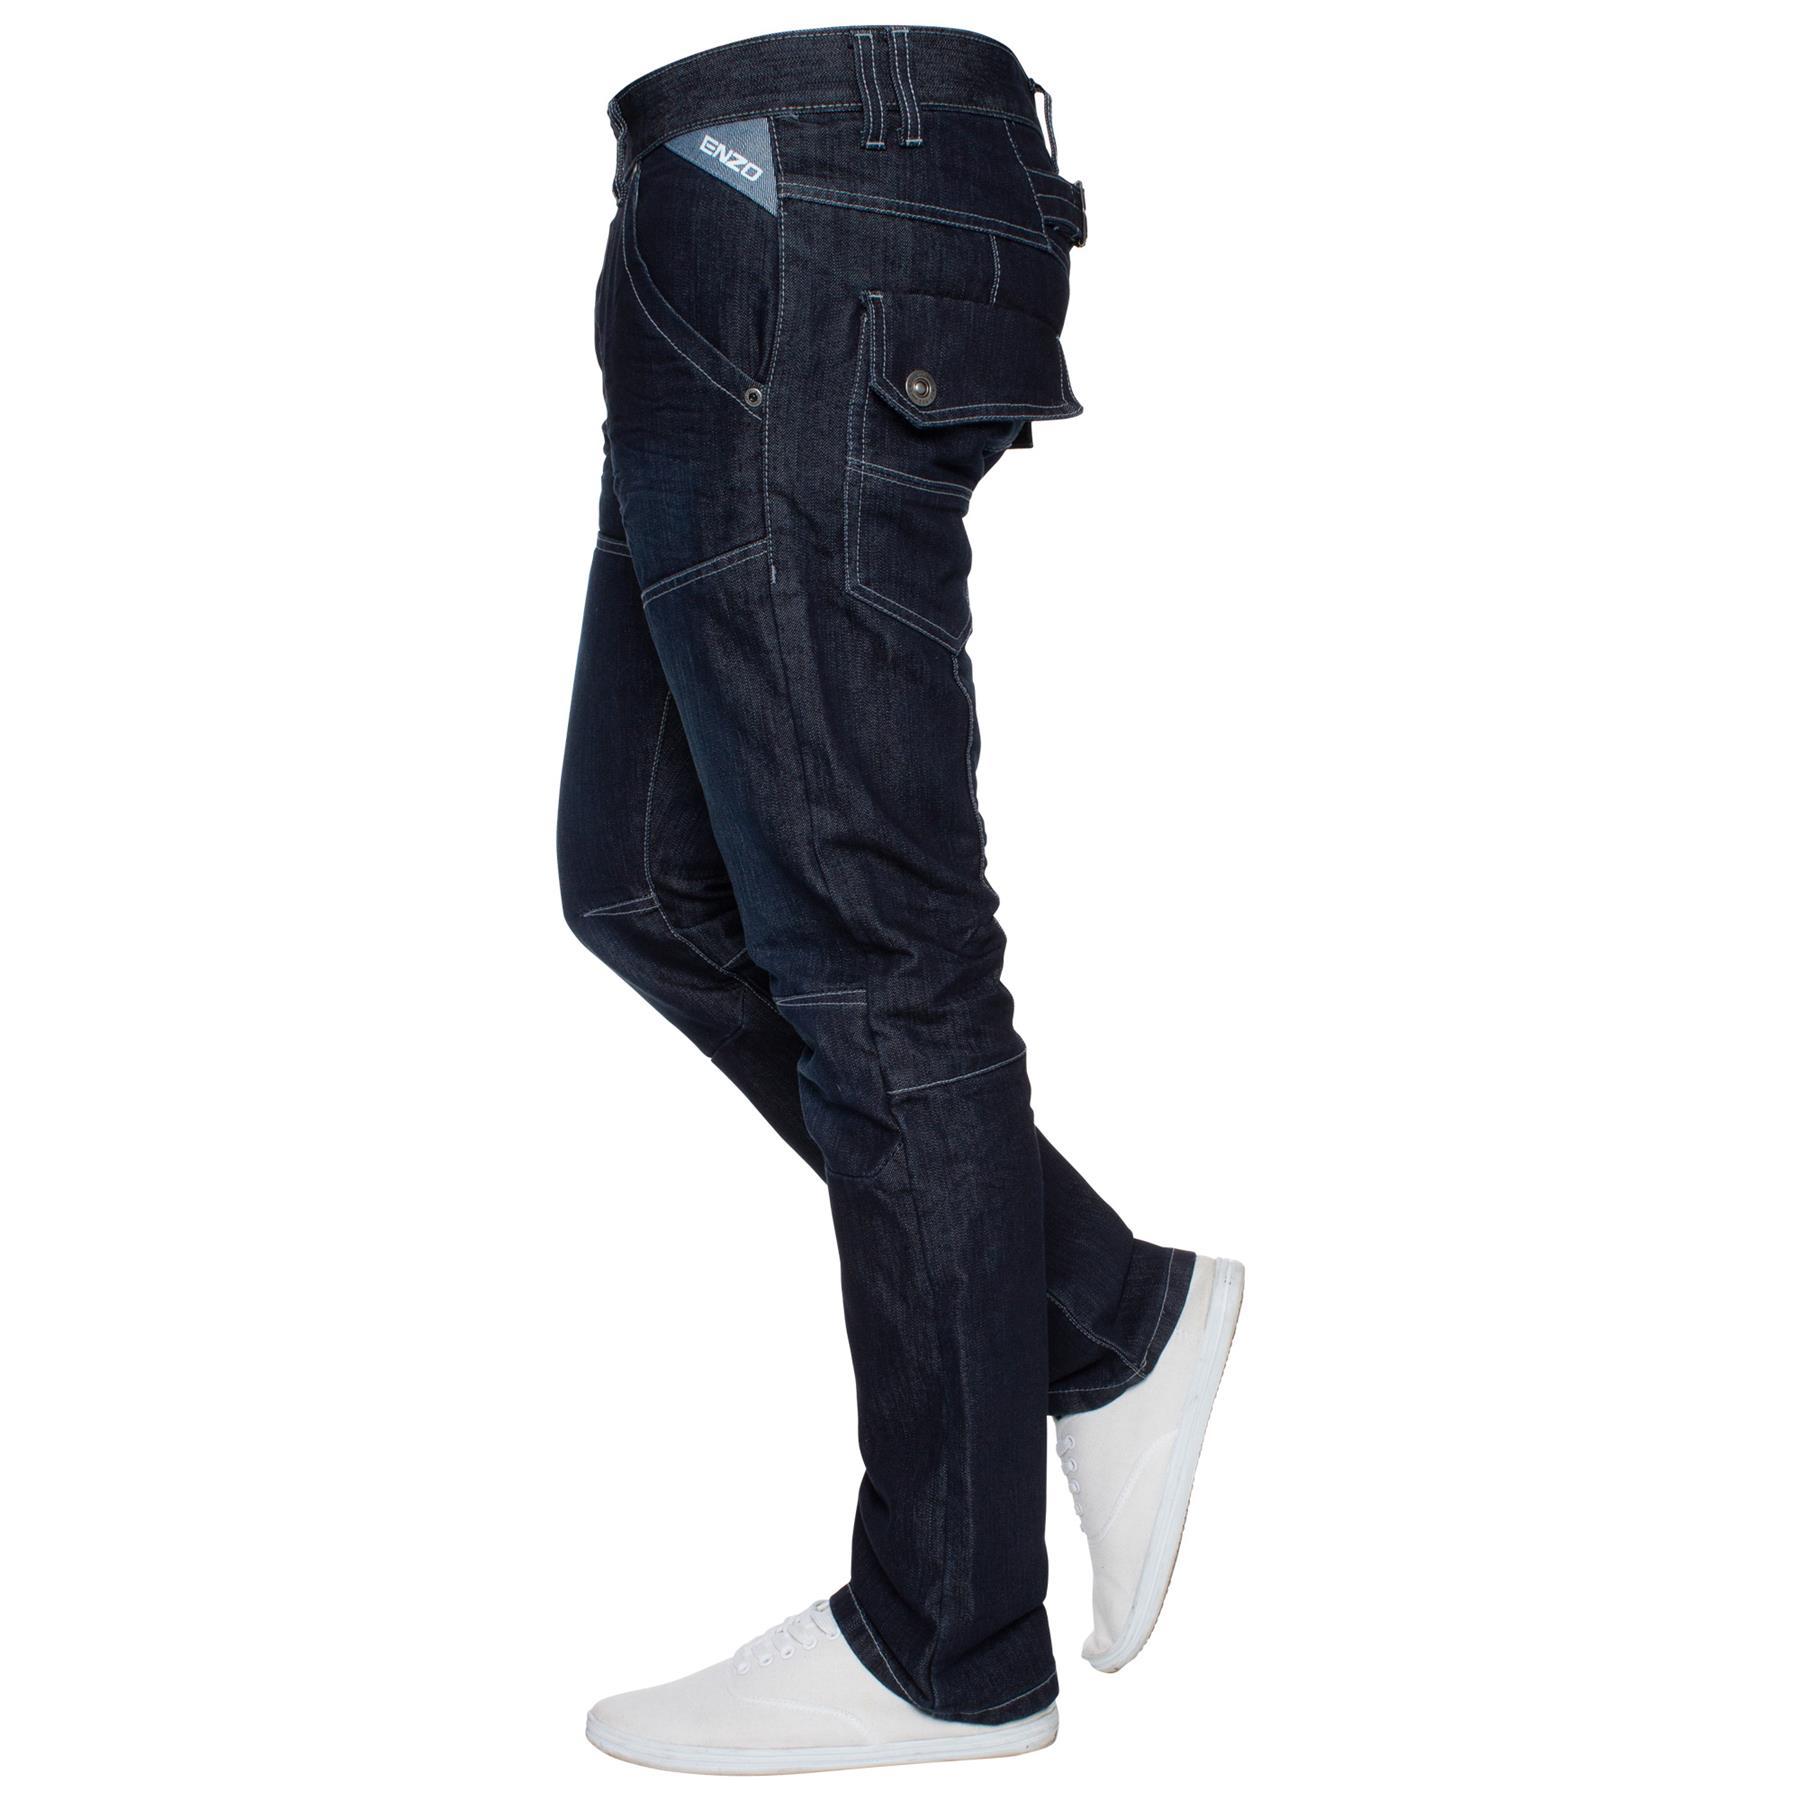 Enzo-Mens-Big-Tall-Jeans-Leg-King-Size-Denim-Pants-Chino-Trousers-Pants-44-034-60-034 thumbnail 70